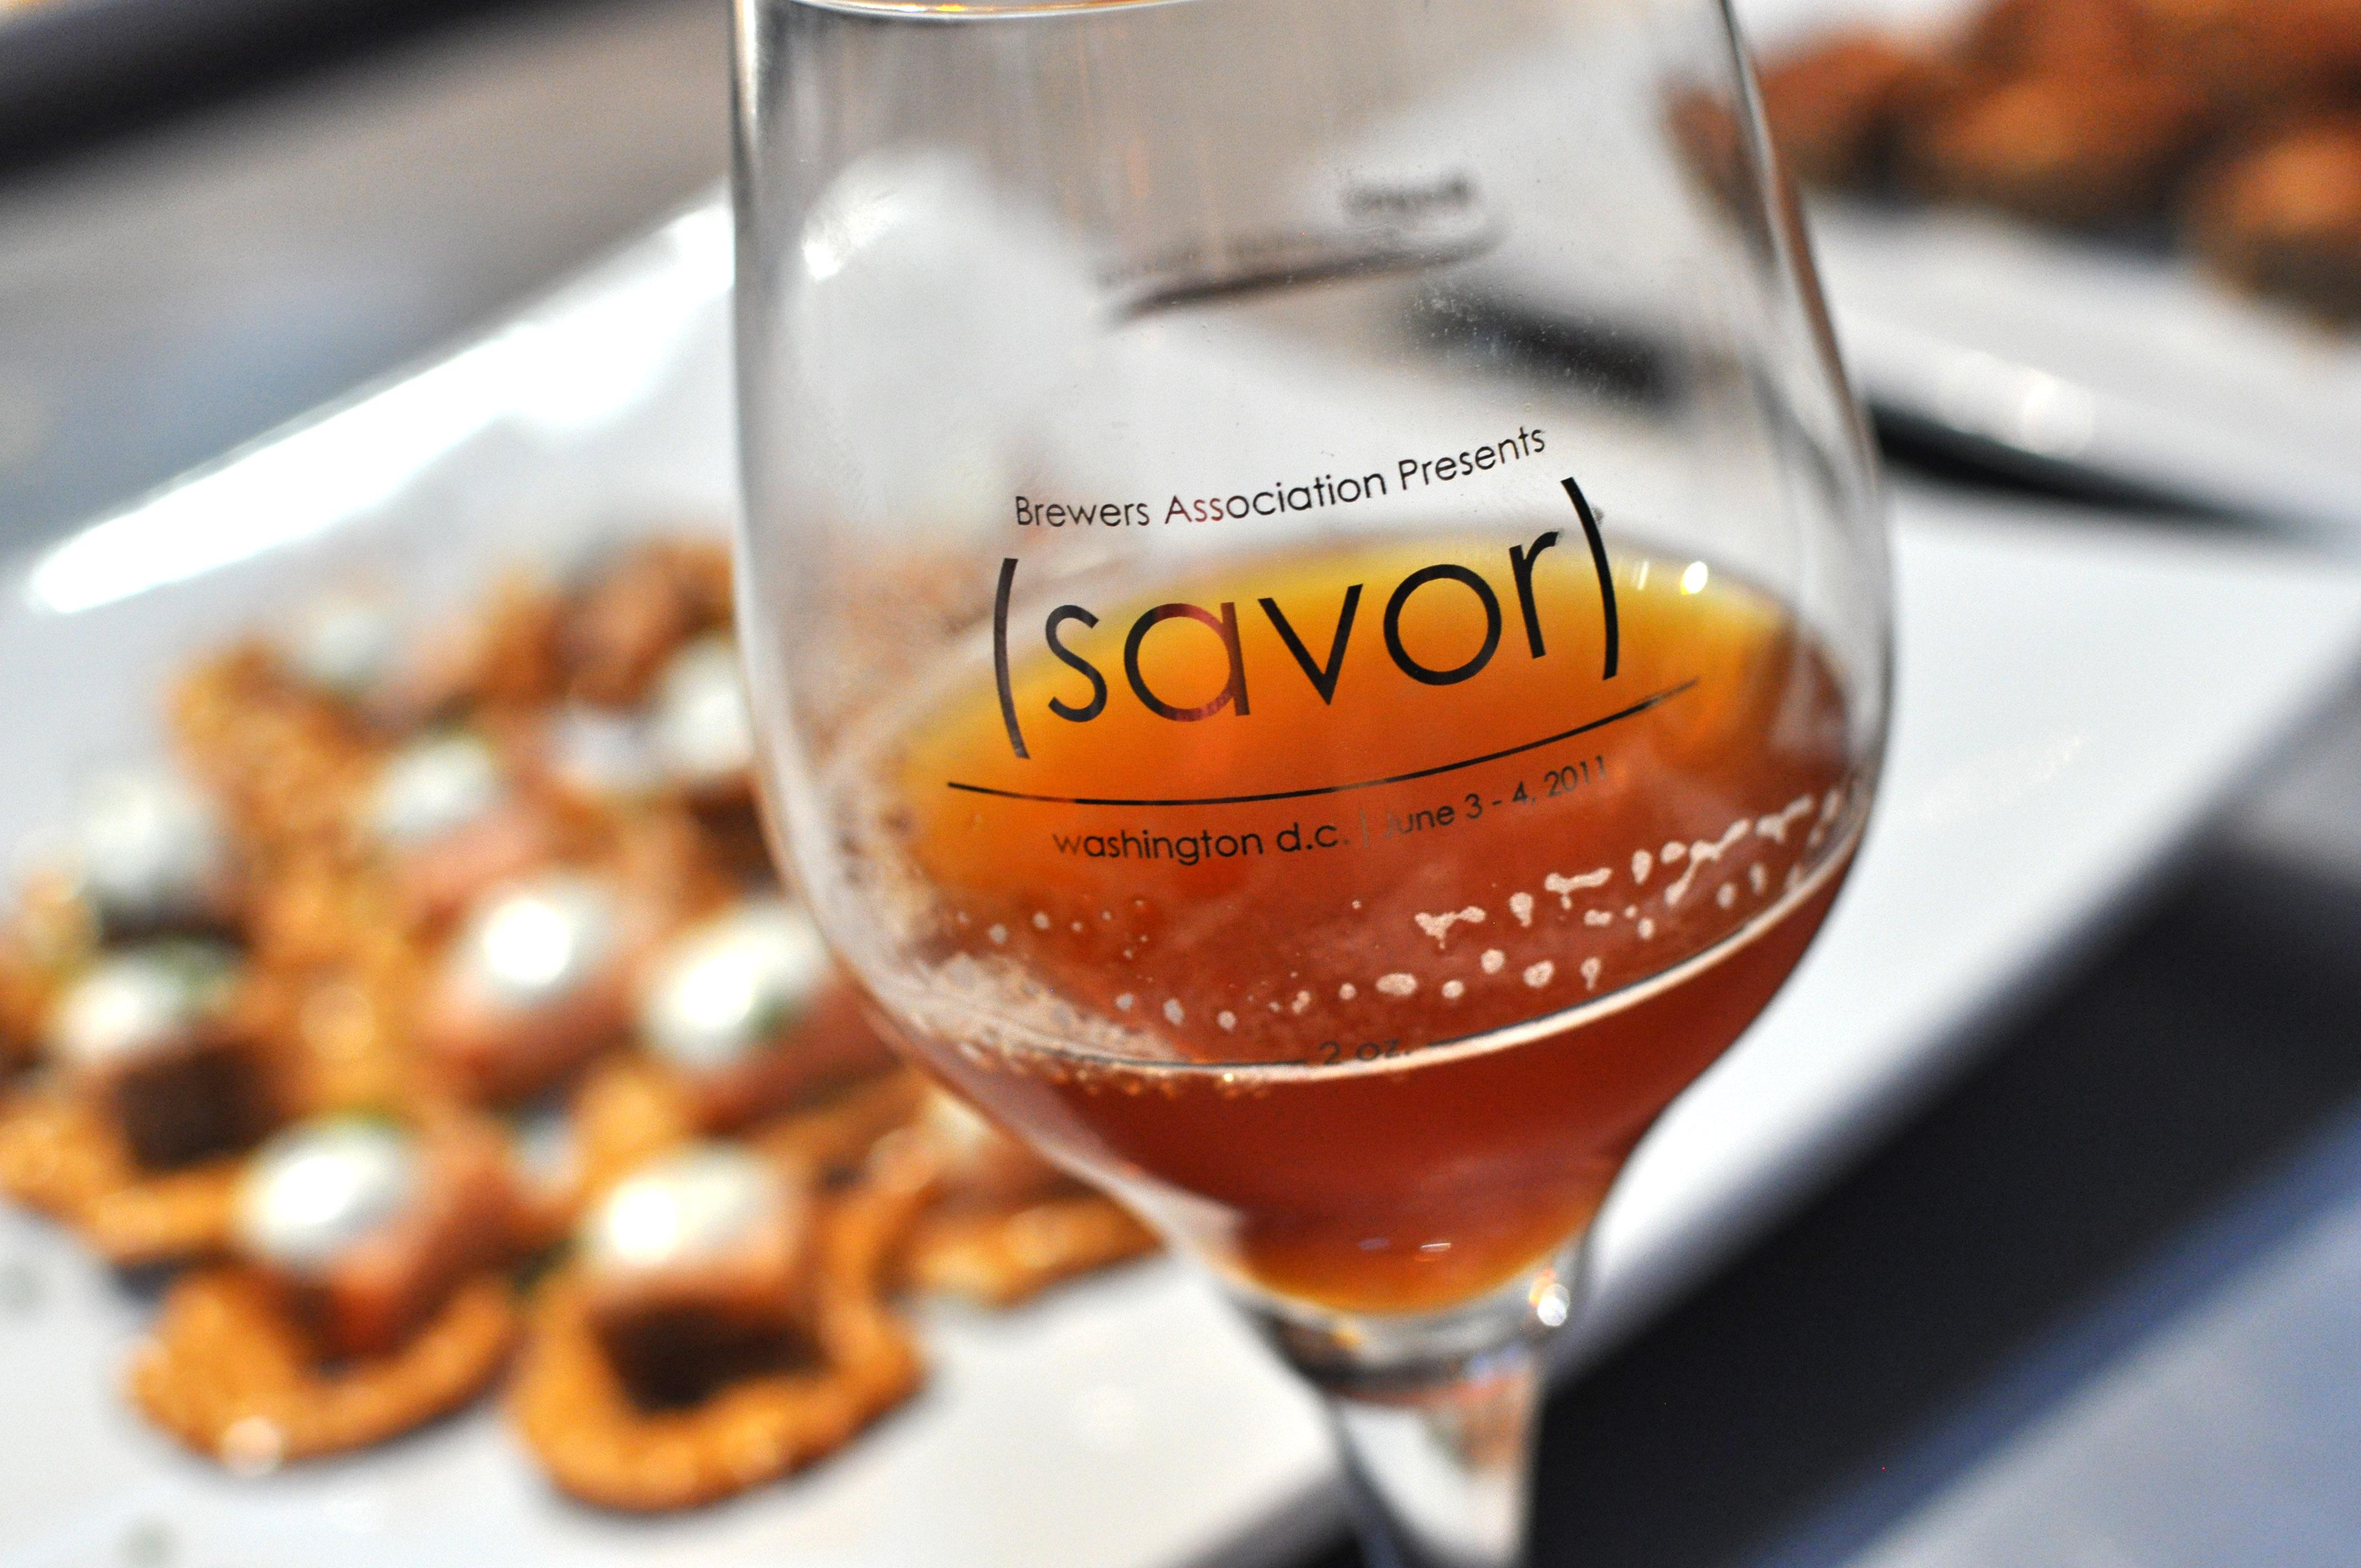 SAVOR 2011. Photo courtesy of the Brewers Association. Photo credit: Eddie Arrossi.